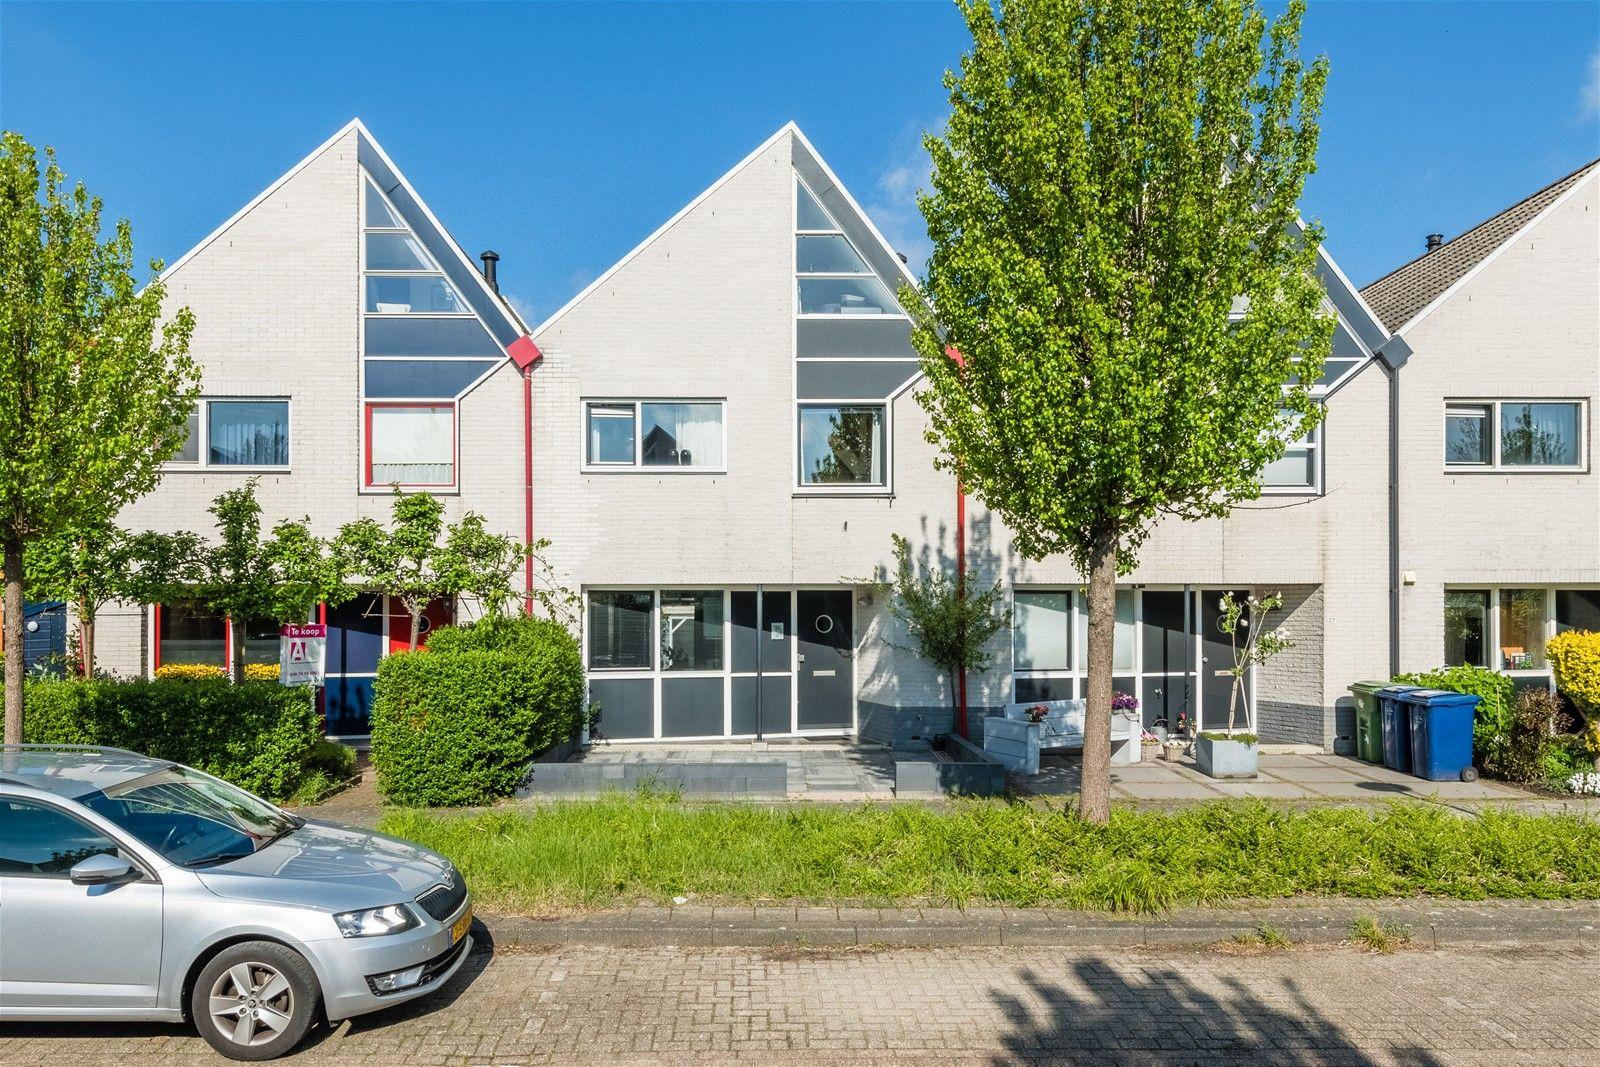 Dwarsfluitstraat 35, Almere